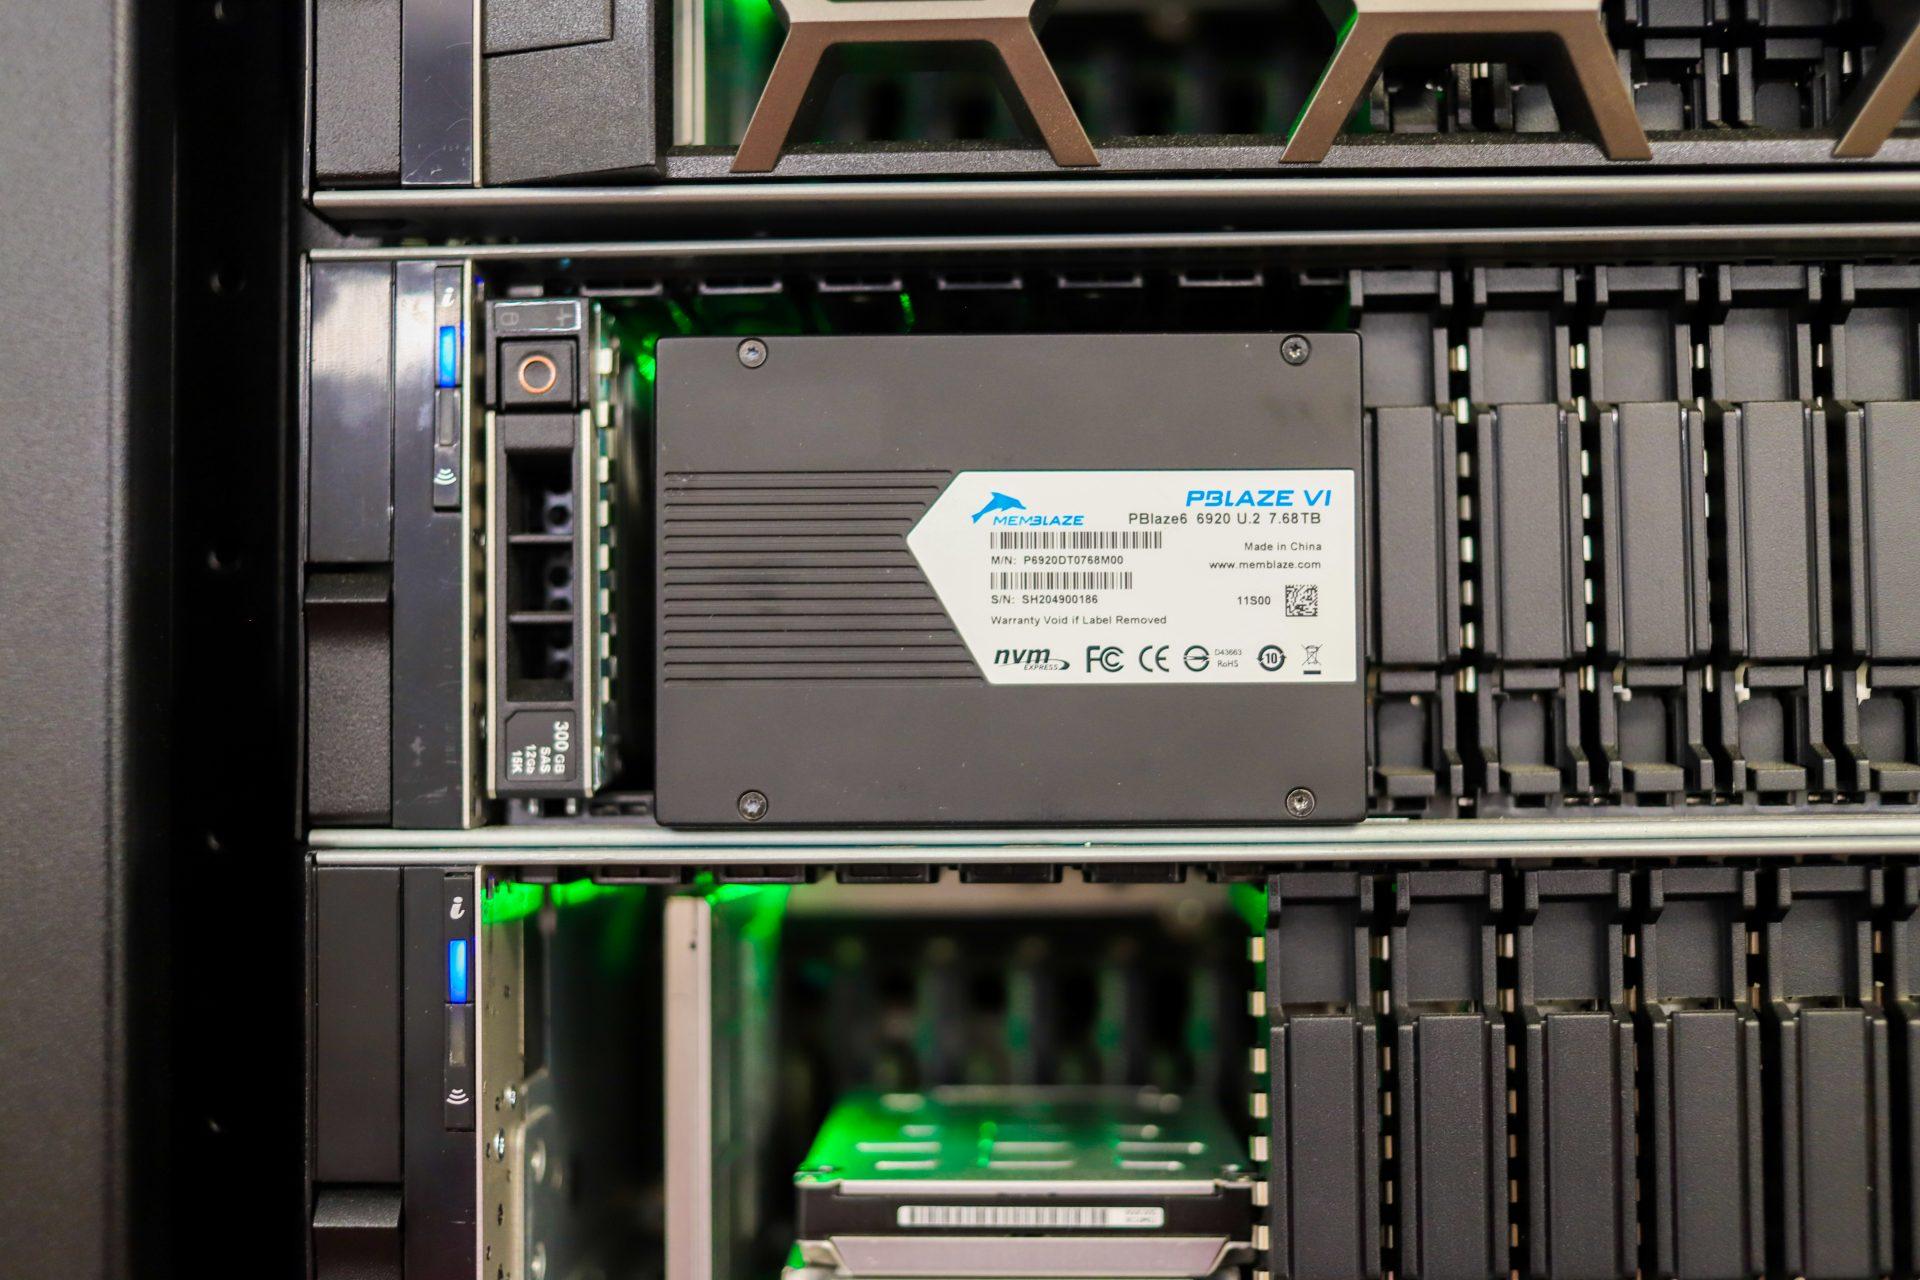 Memblaze PBlaze6 6920 server